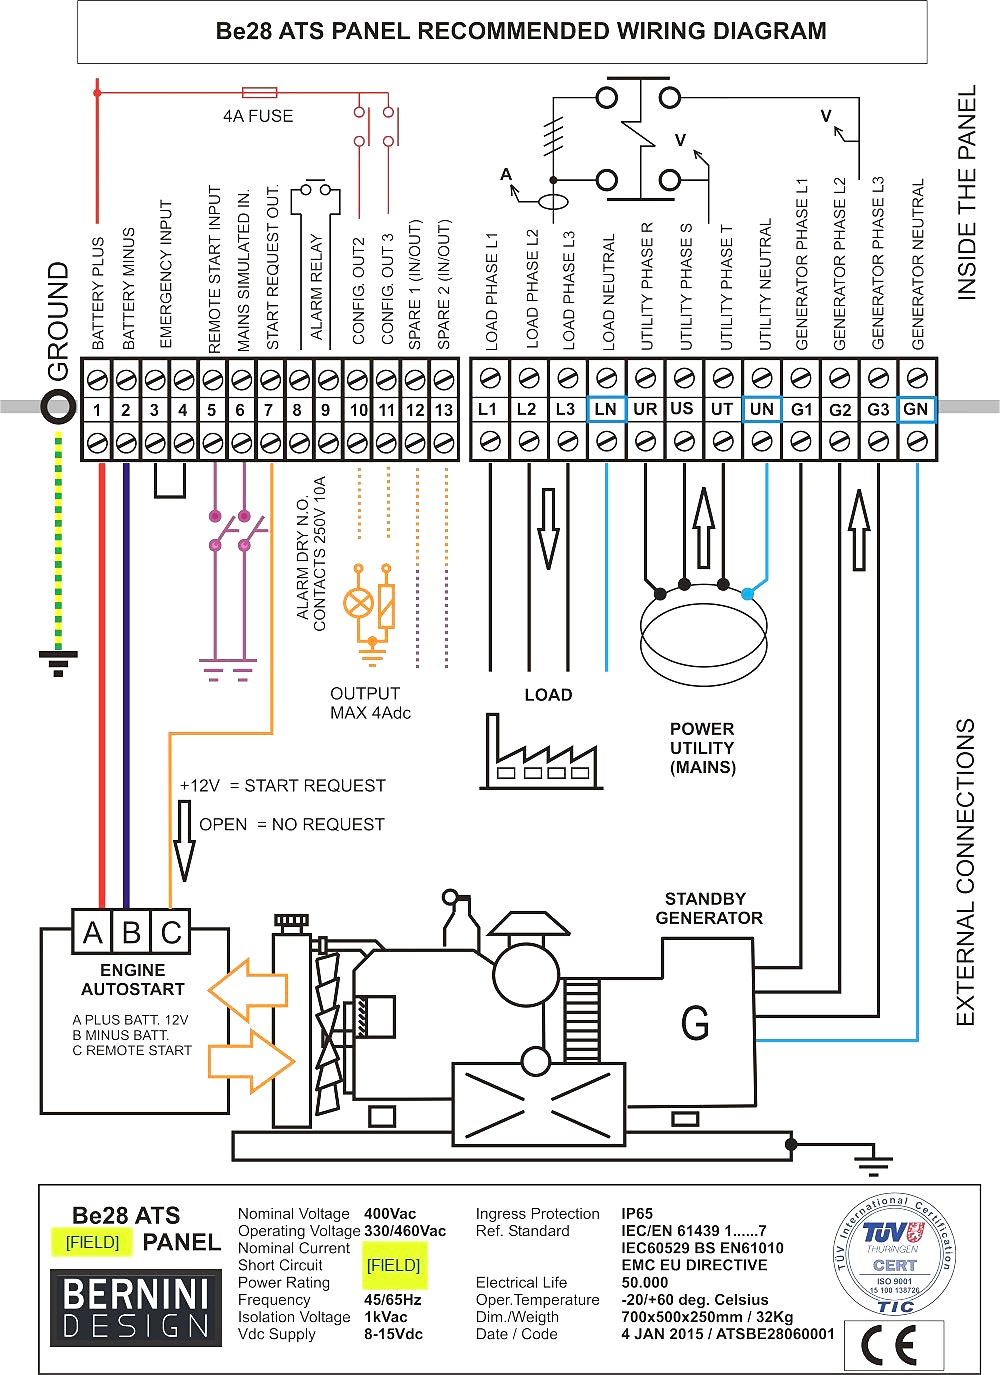 generac generator wiring diagram Collection-Generac Generator Wiring Diagram 6-n